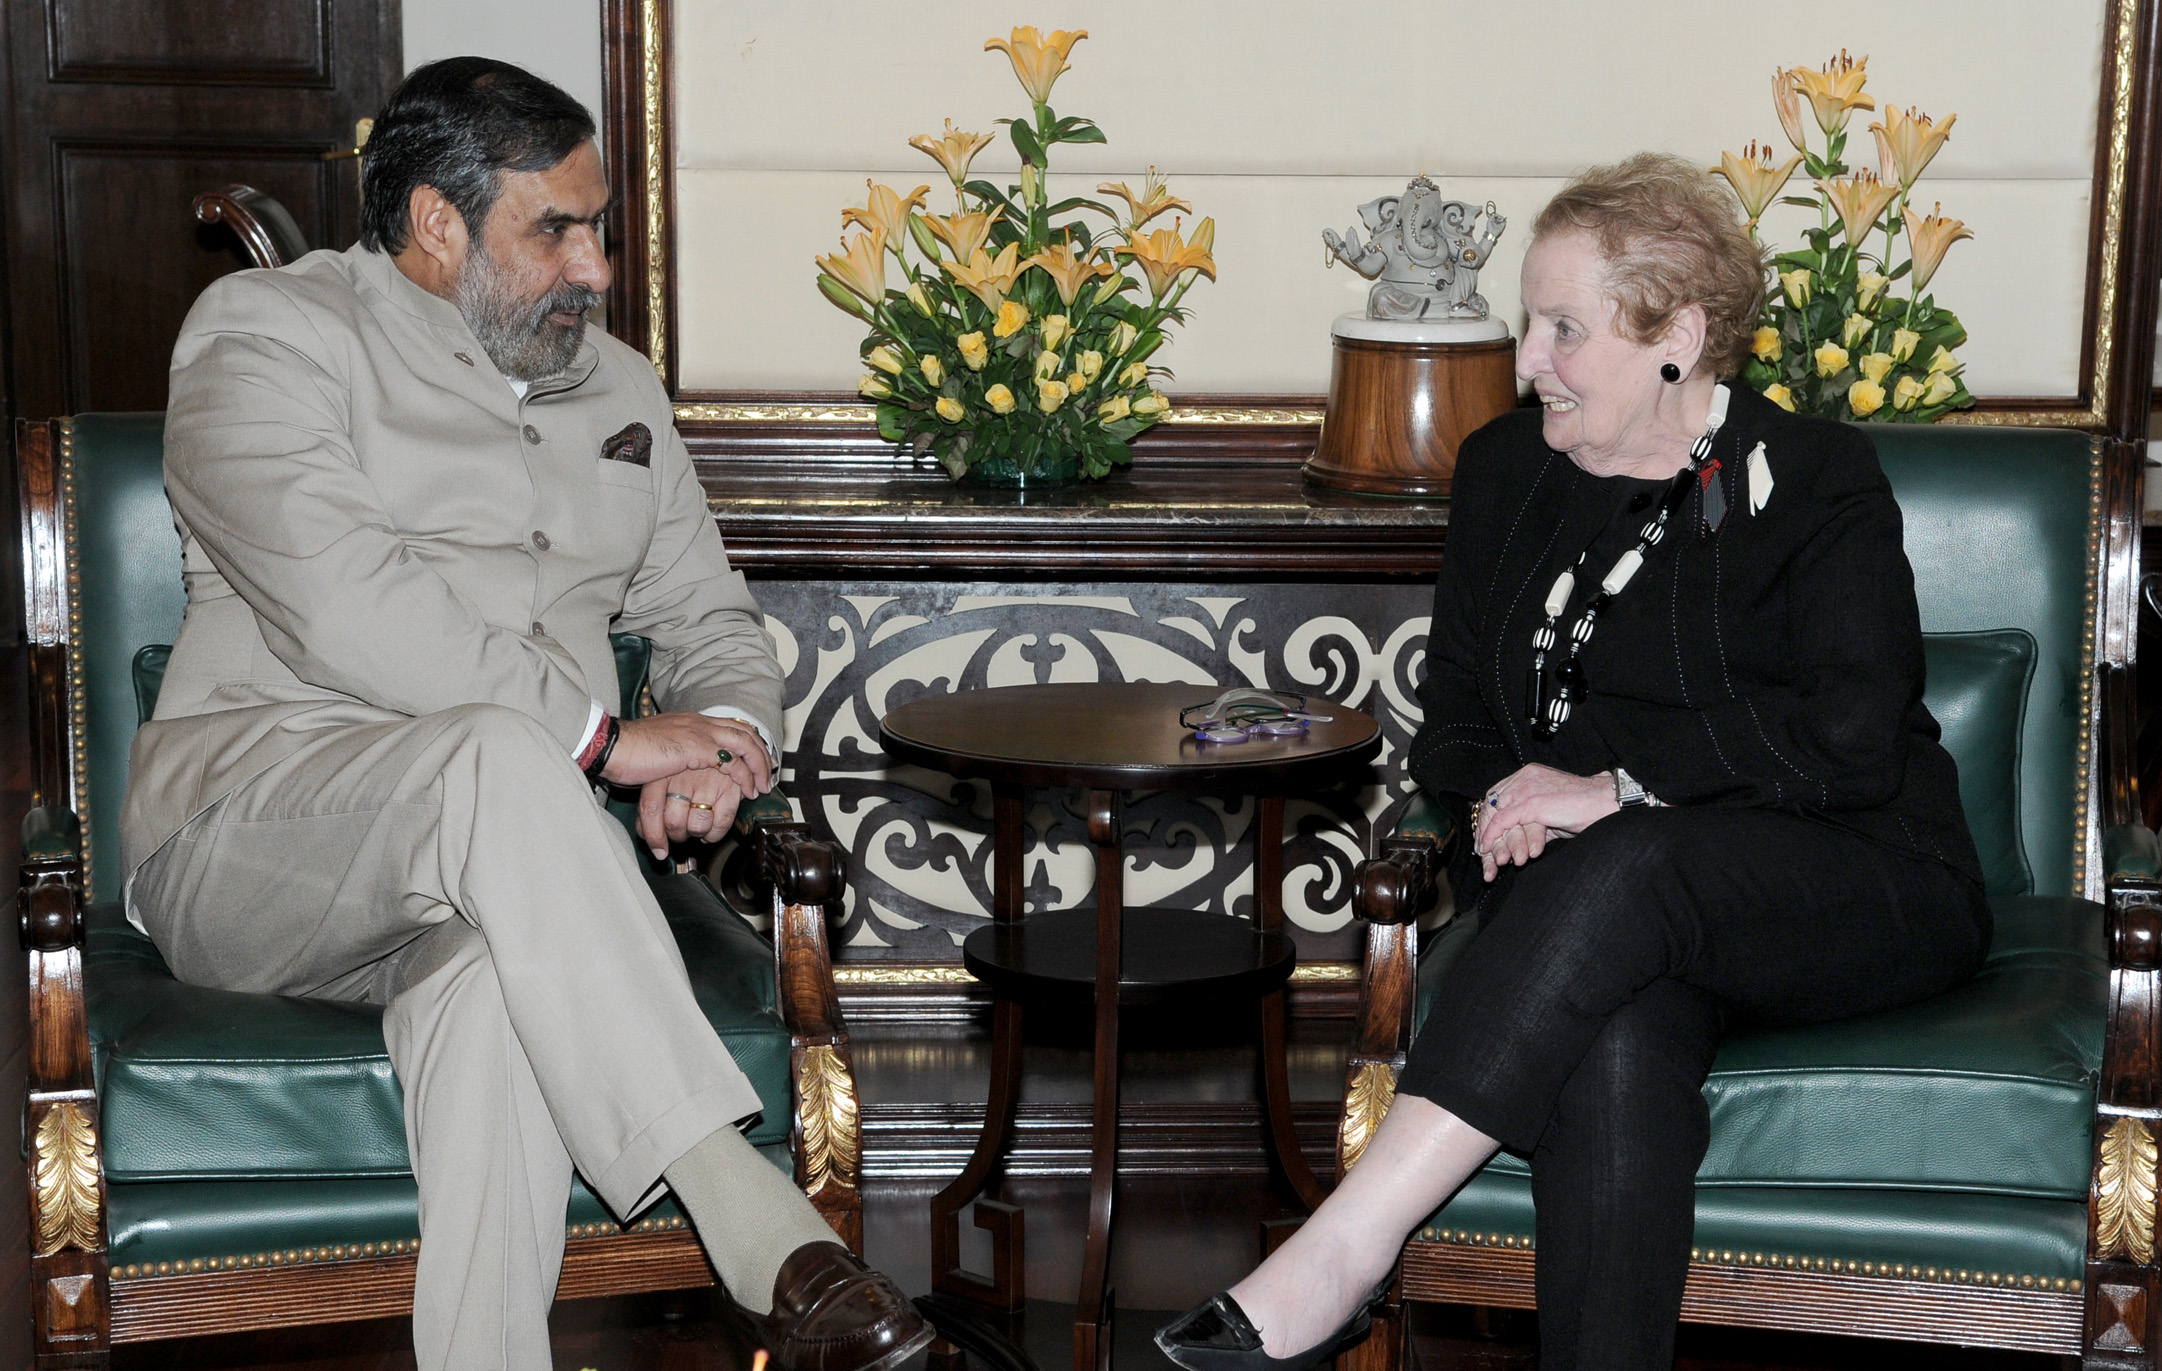 Madeleine Albright draagt twee broches en een halssieraad en Shri Anand Sharma, New Delhi, 27 juni 2012, portret